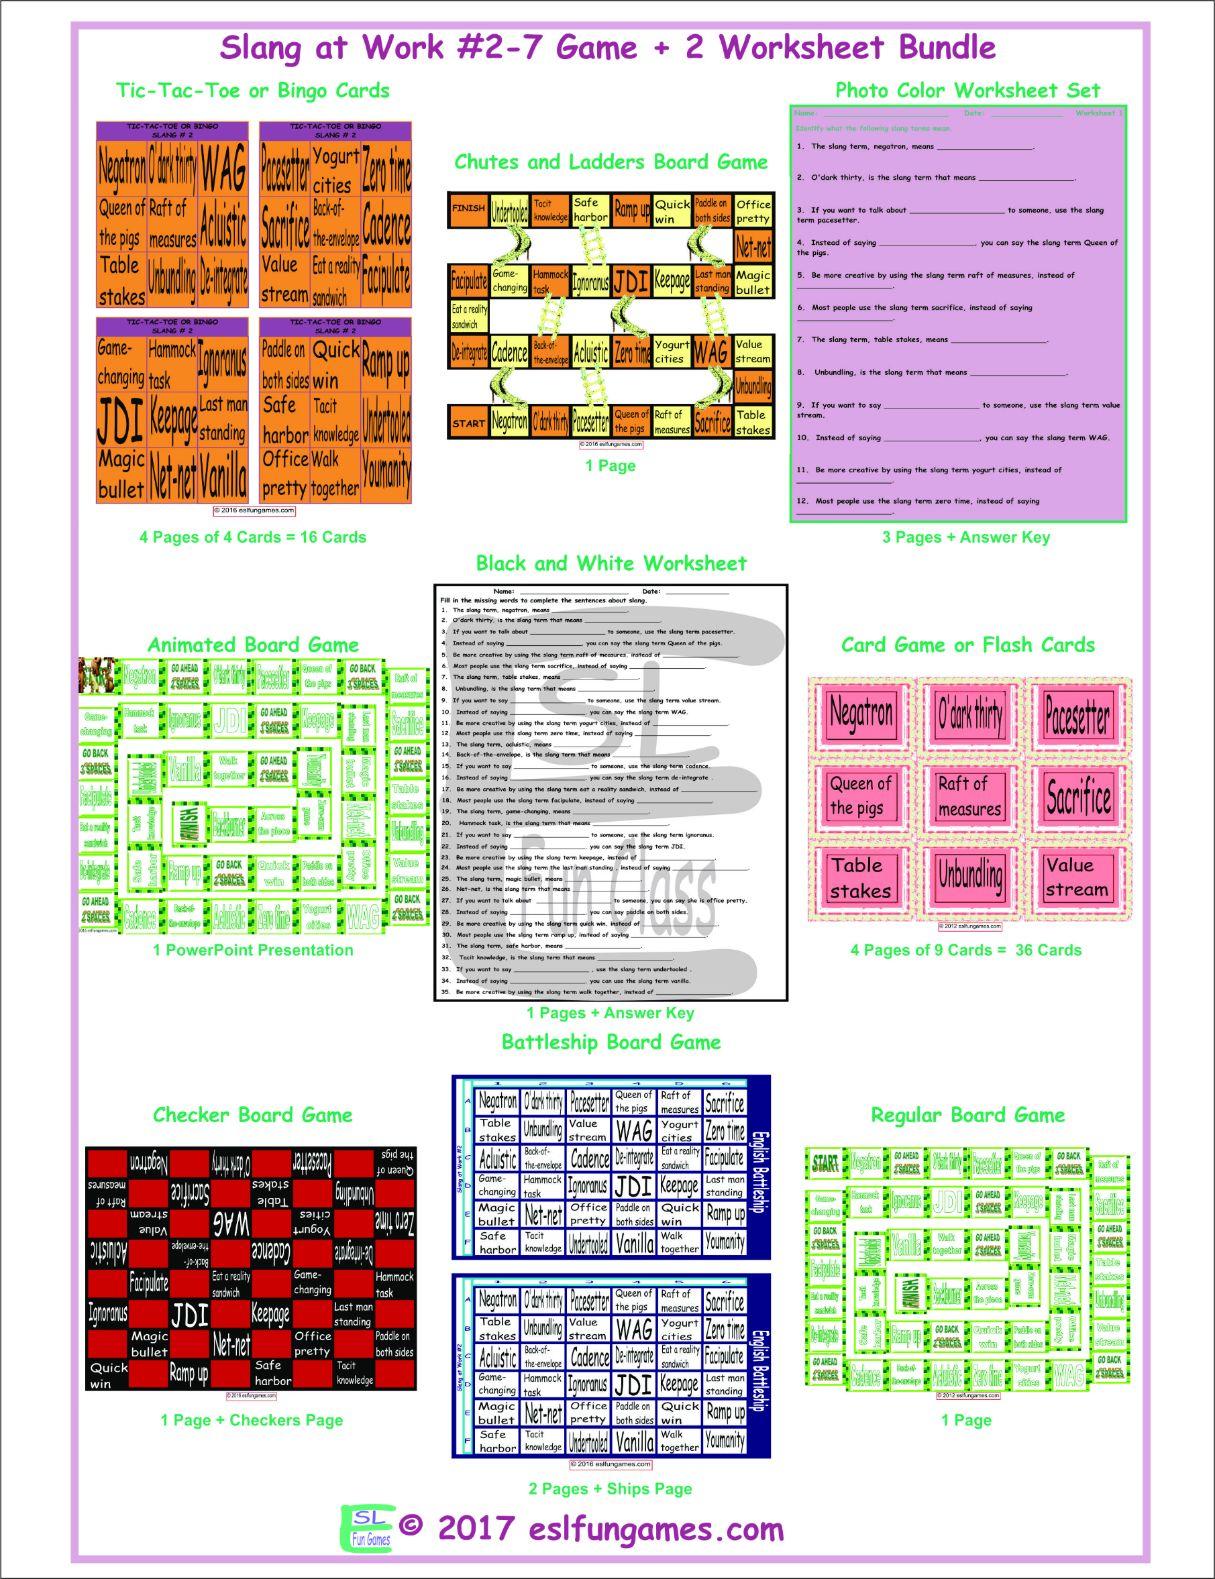 Slang At Work 2 7 Game Plus 2 Worksheet Bundle